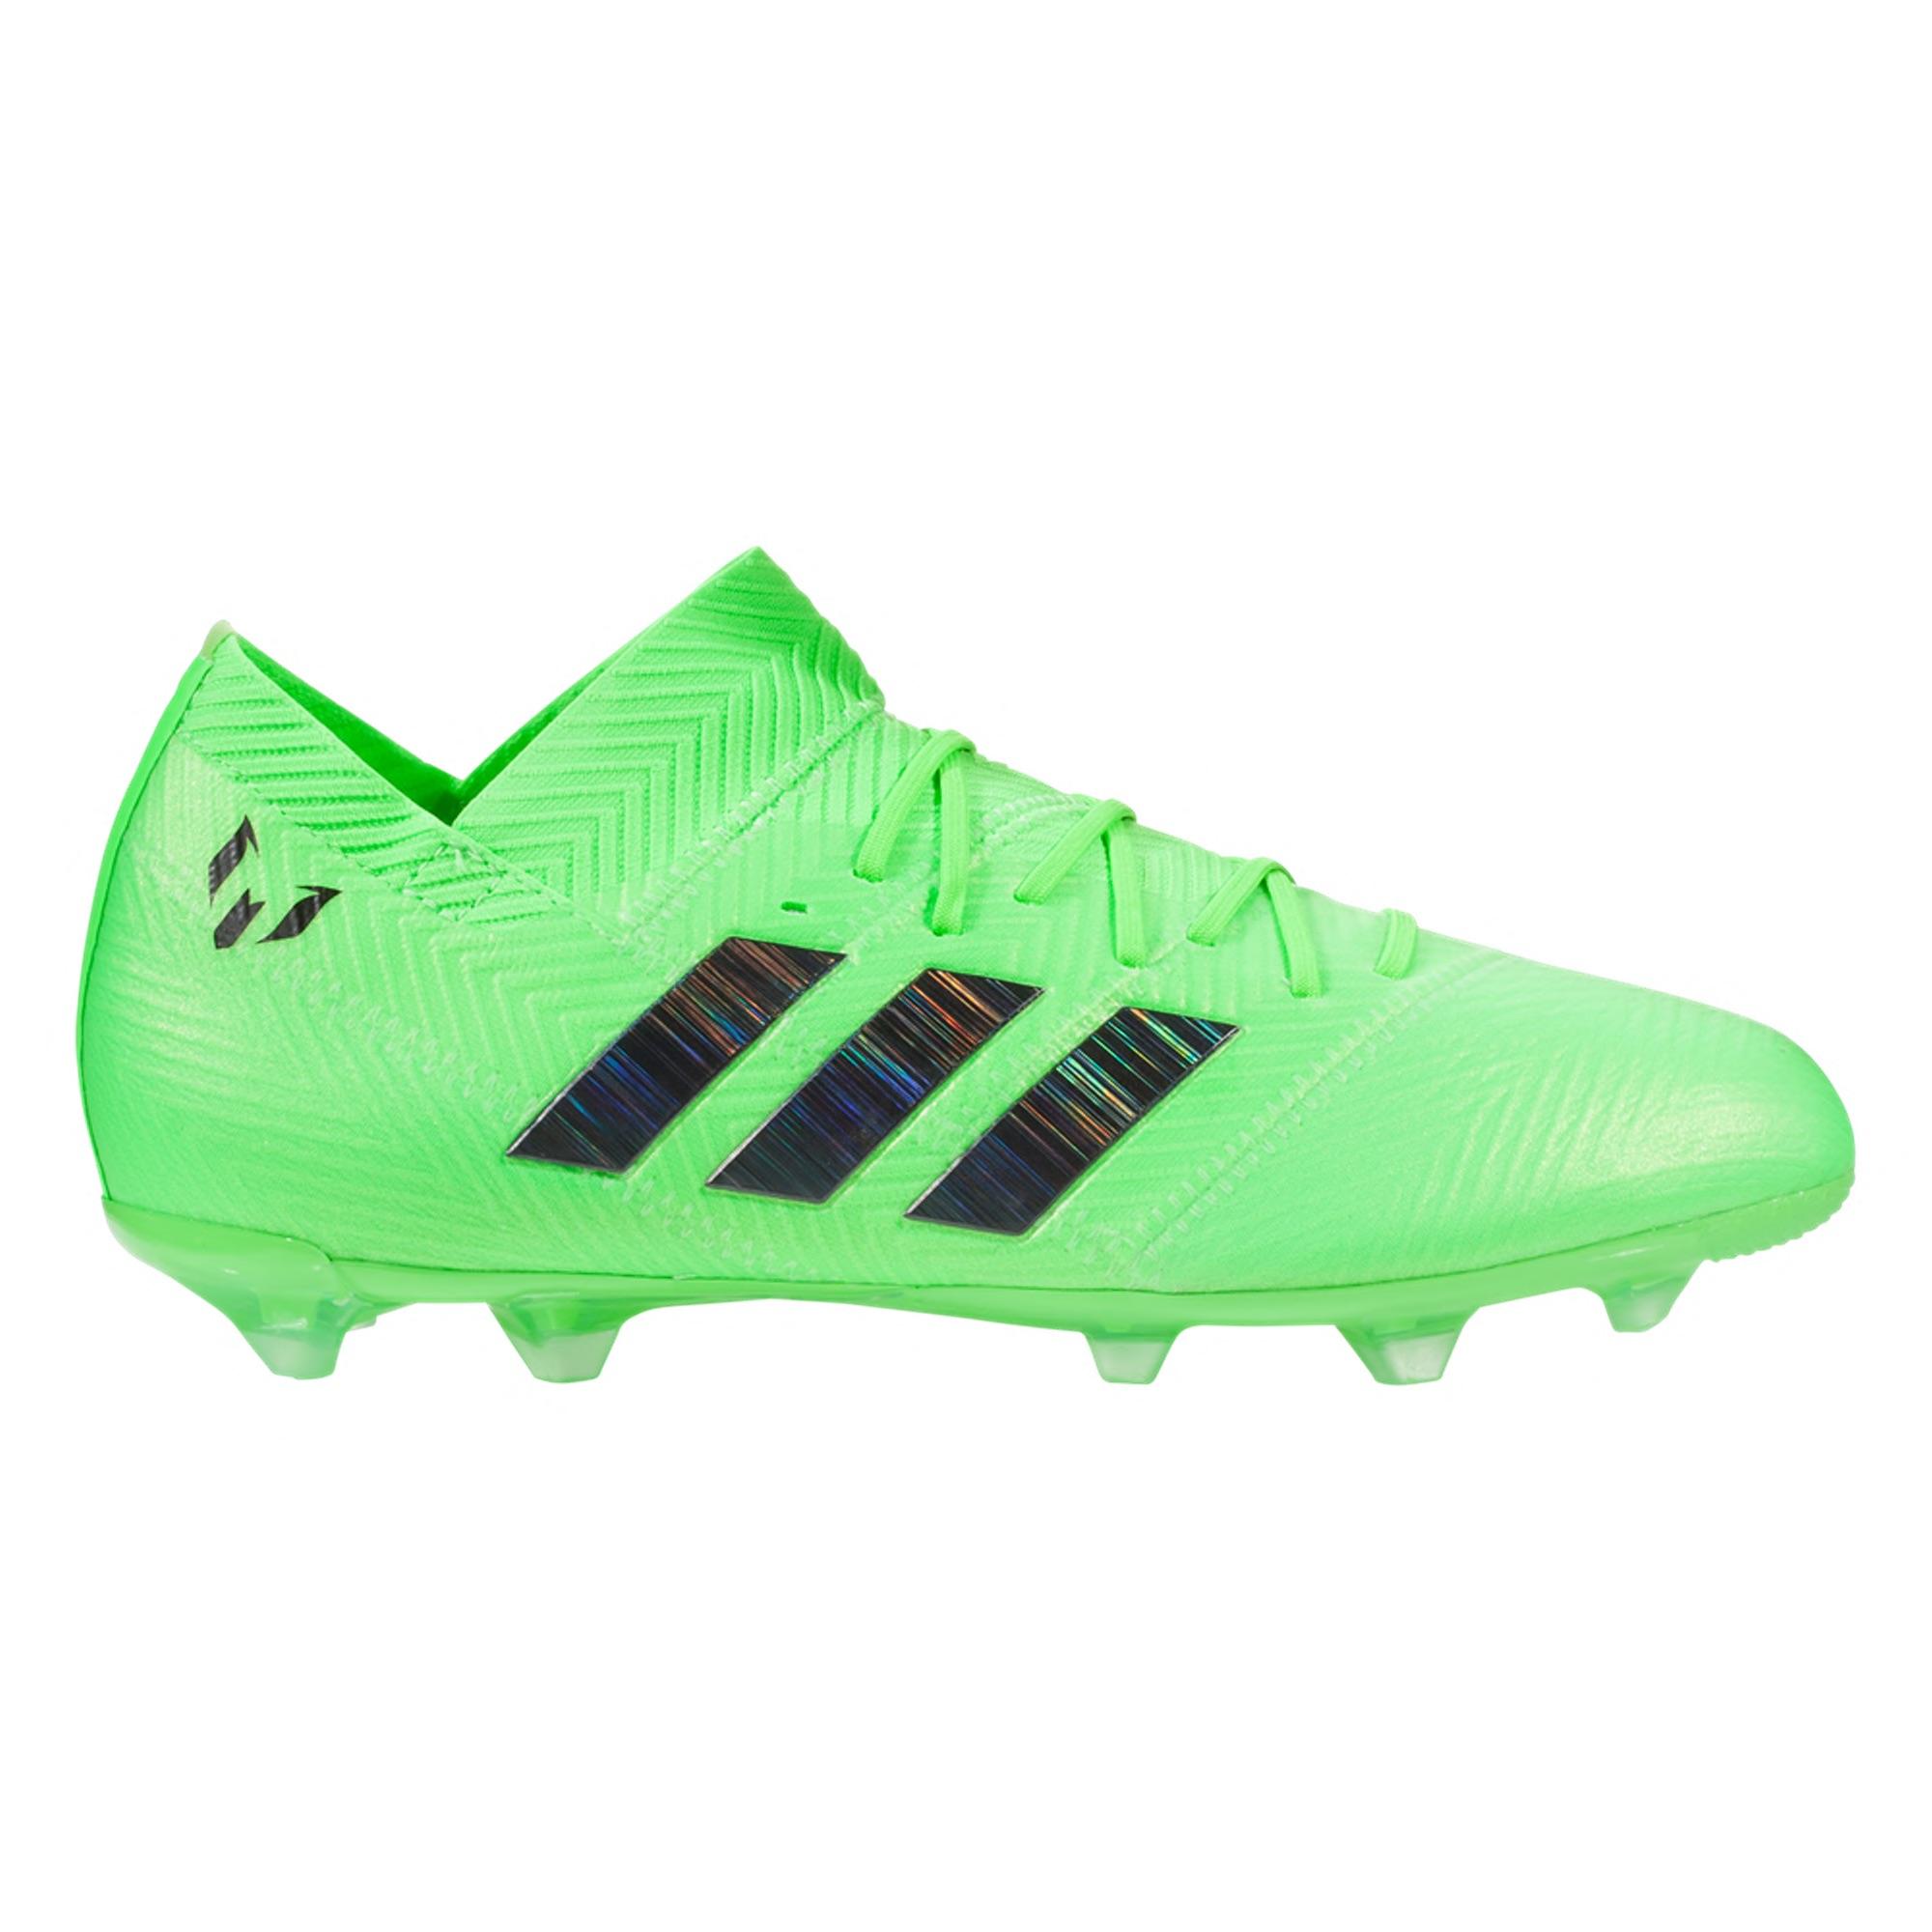 20c0abb46 Home   Brand   Adidas   Adidas Nemeziz Messi 18.1 FG Soccer Cleats – Solar  Green Core Black Solar Green